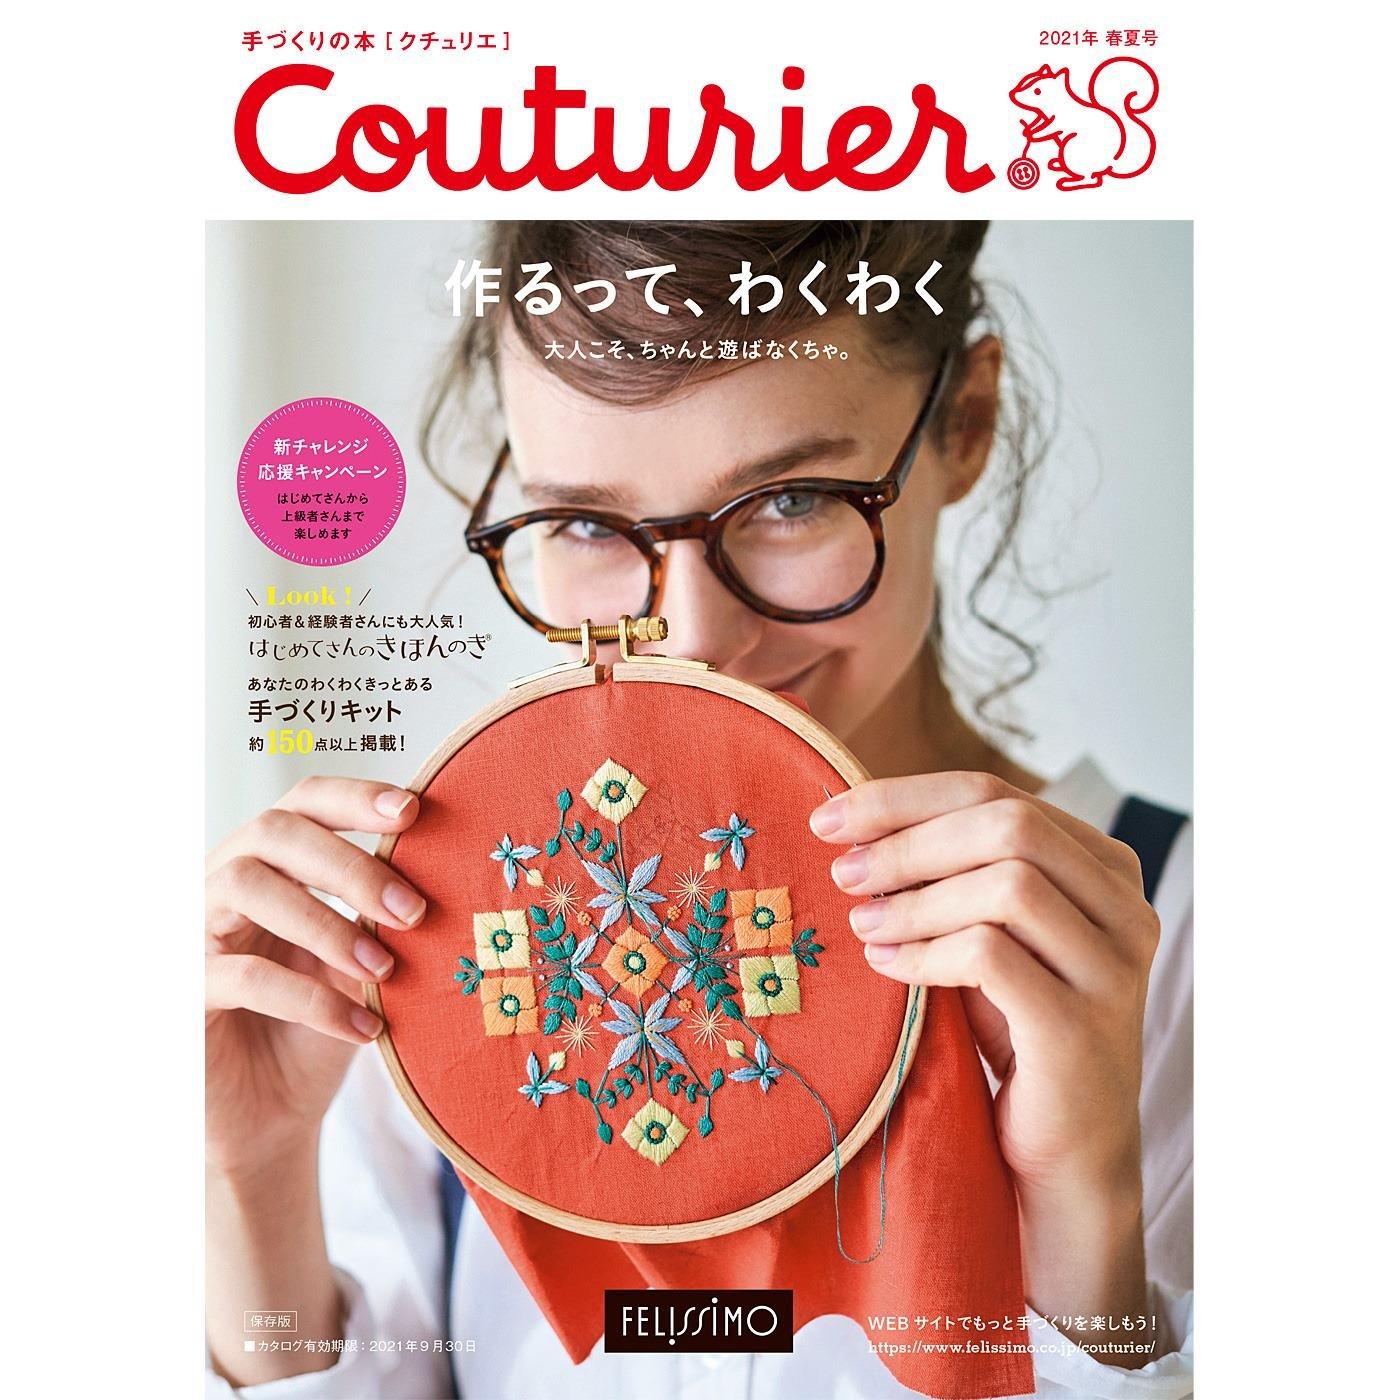 Couturier[クチュリエ] 2021年 春夏号